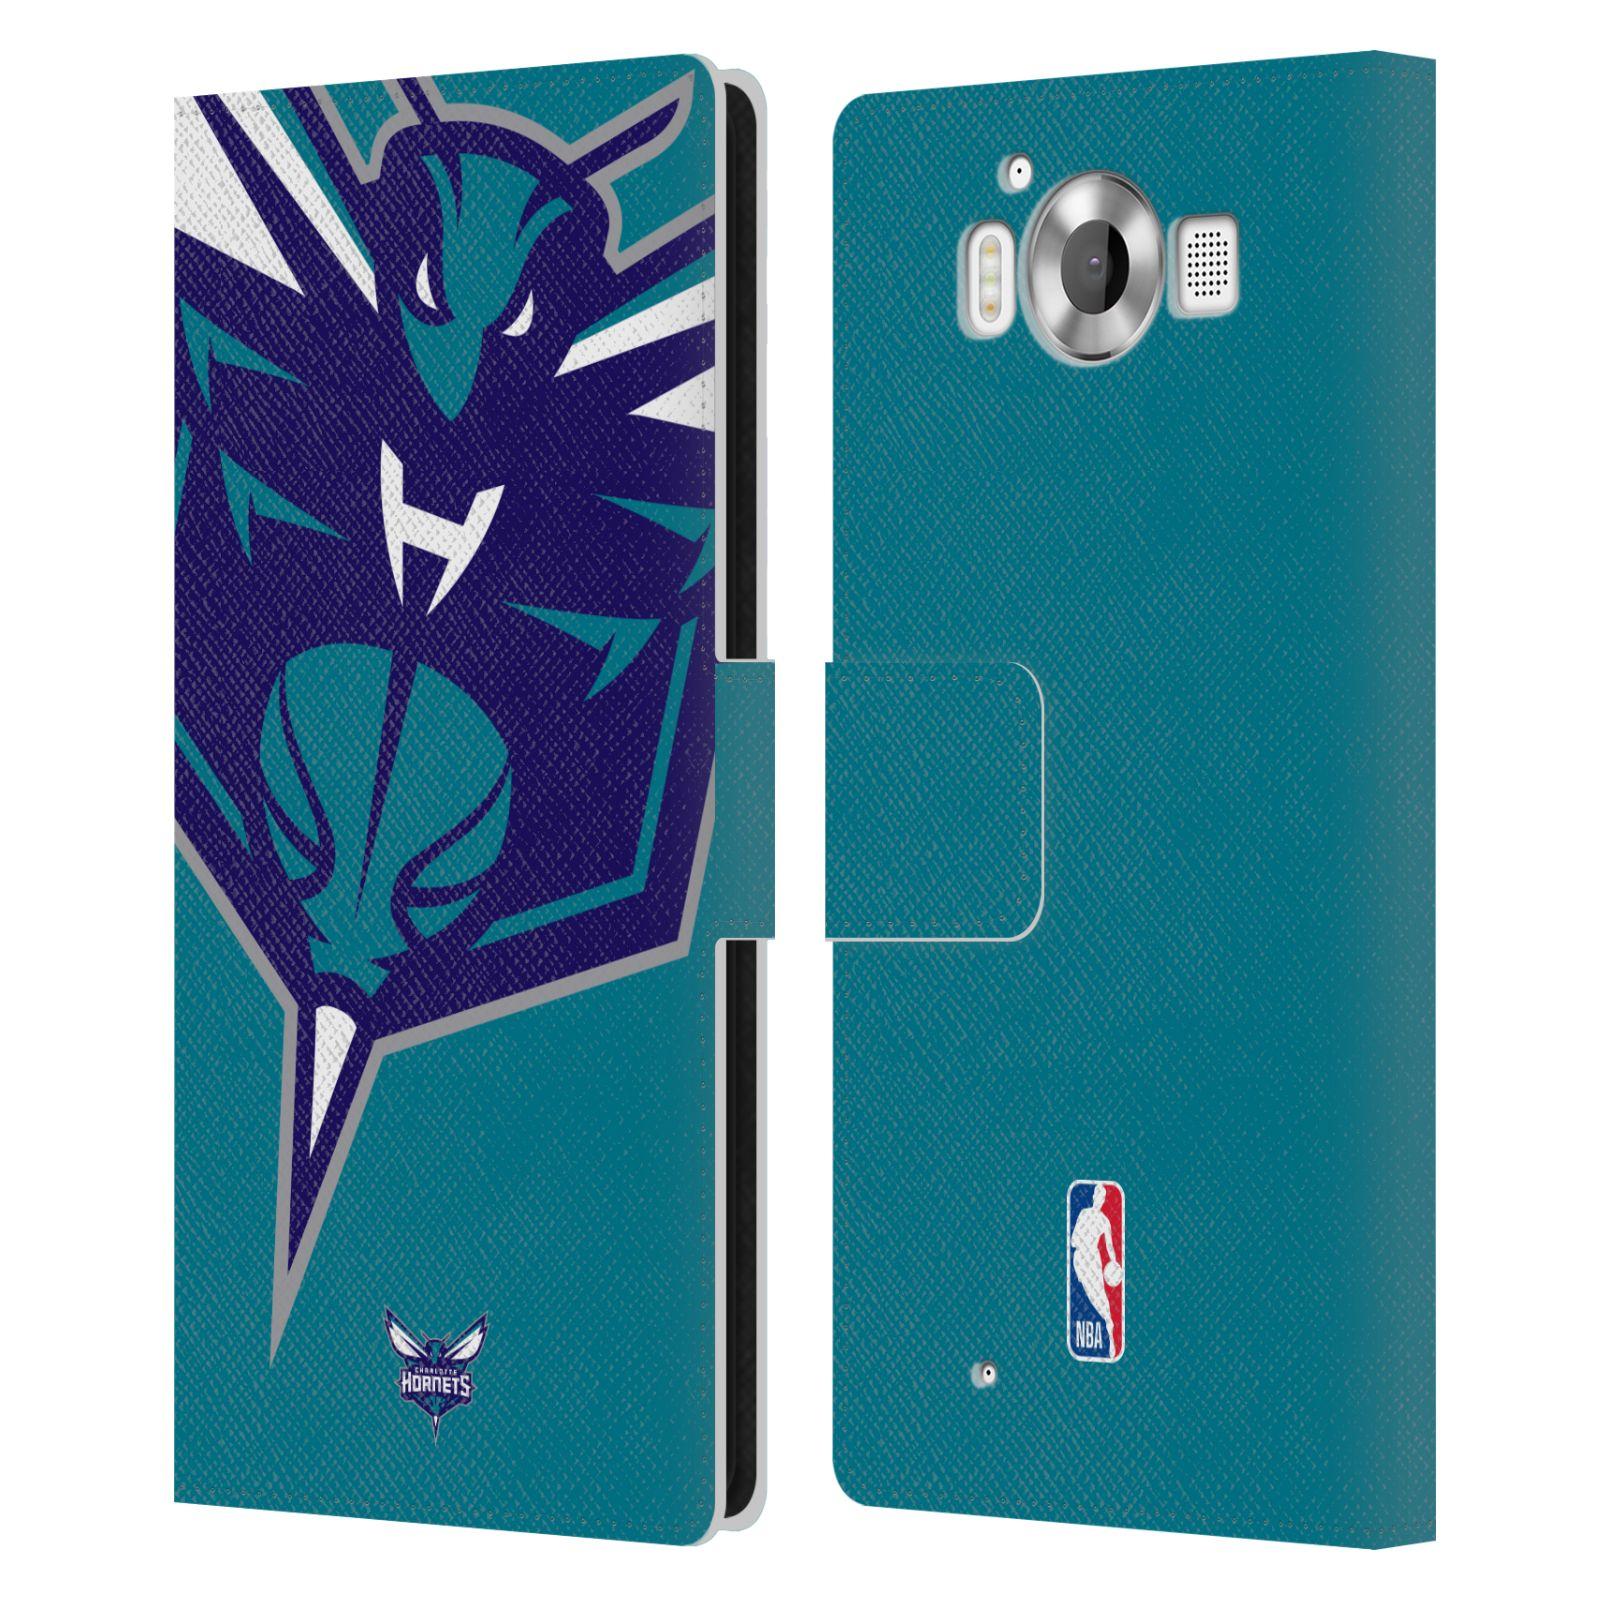 Pouzdro na mobil Nokia Lumia 950 - Head Case -NBA - Charlotte Hornets modrá barva velký znak